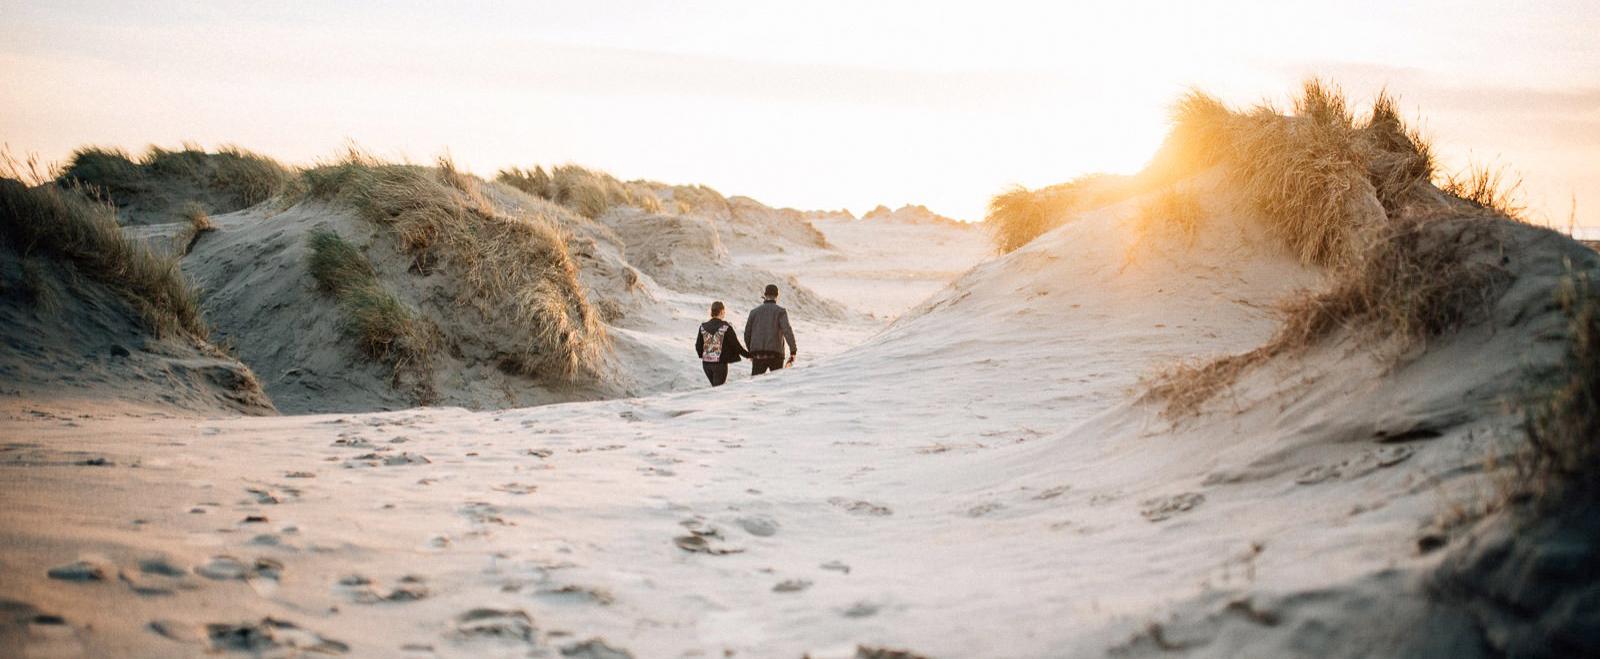 rømø_denmark_couple_Sonnenuntergang_Verlobung_couple_Meer_chucks_Fotograf_Romo_Dünen_Abschied_Prosecco_Shooting_Paarshooting_Wedding_hochzeit_Denmark_Rømø_Dänemark